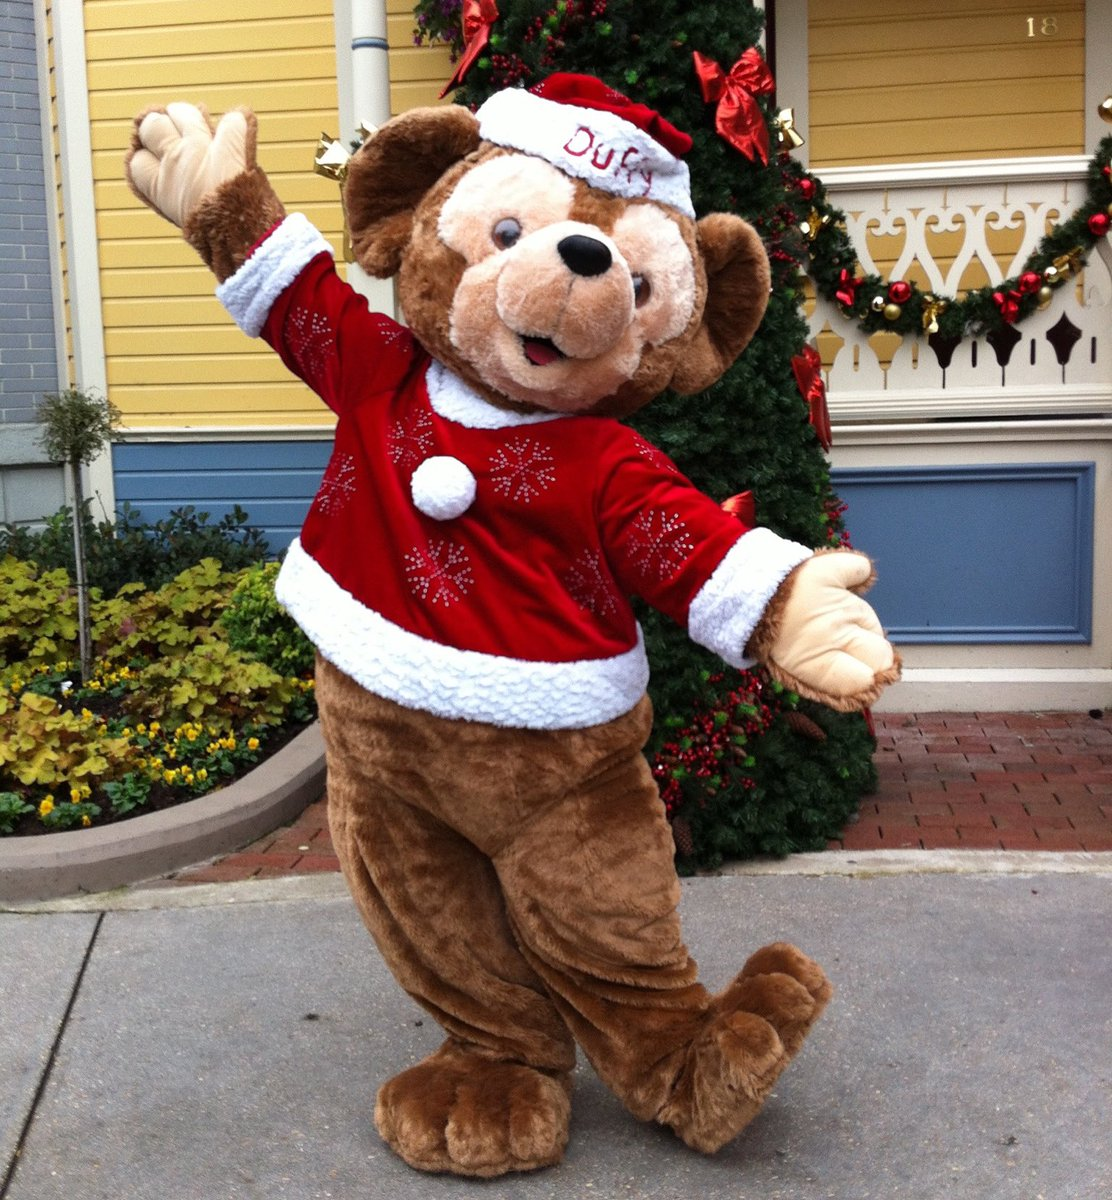 🎄Merry Christmas ! 🐻♥️💫 🎄   #disneylandparis #disneyparks #disneyXmas #duffythedisneybear #MerryChristmas2019